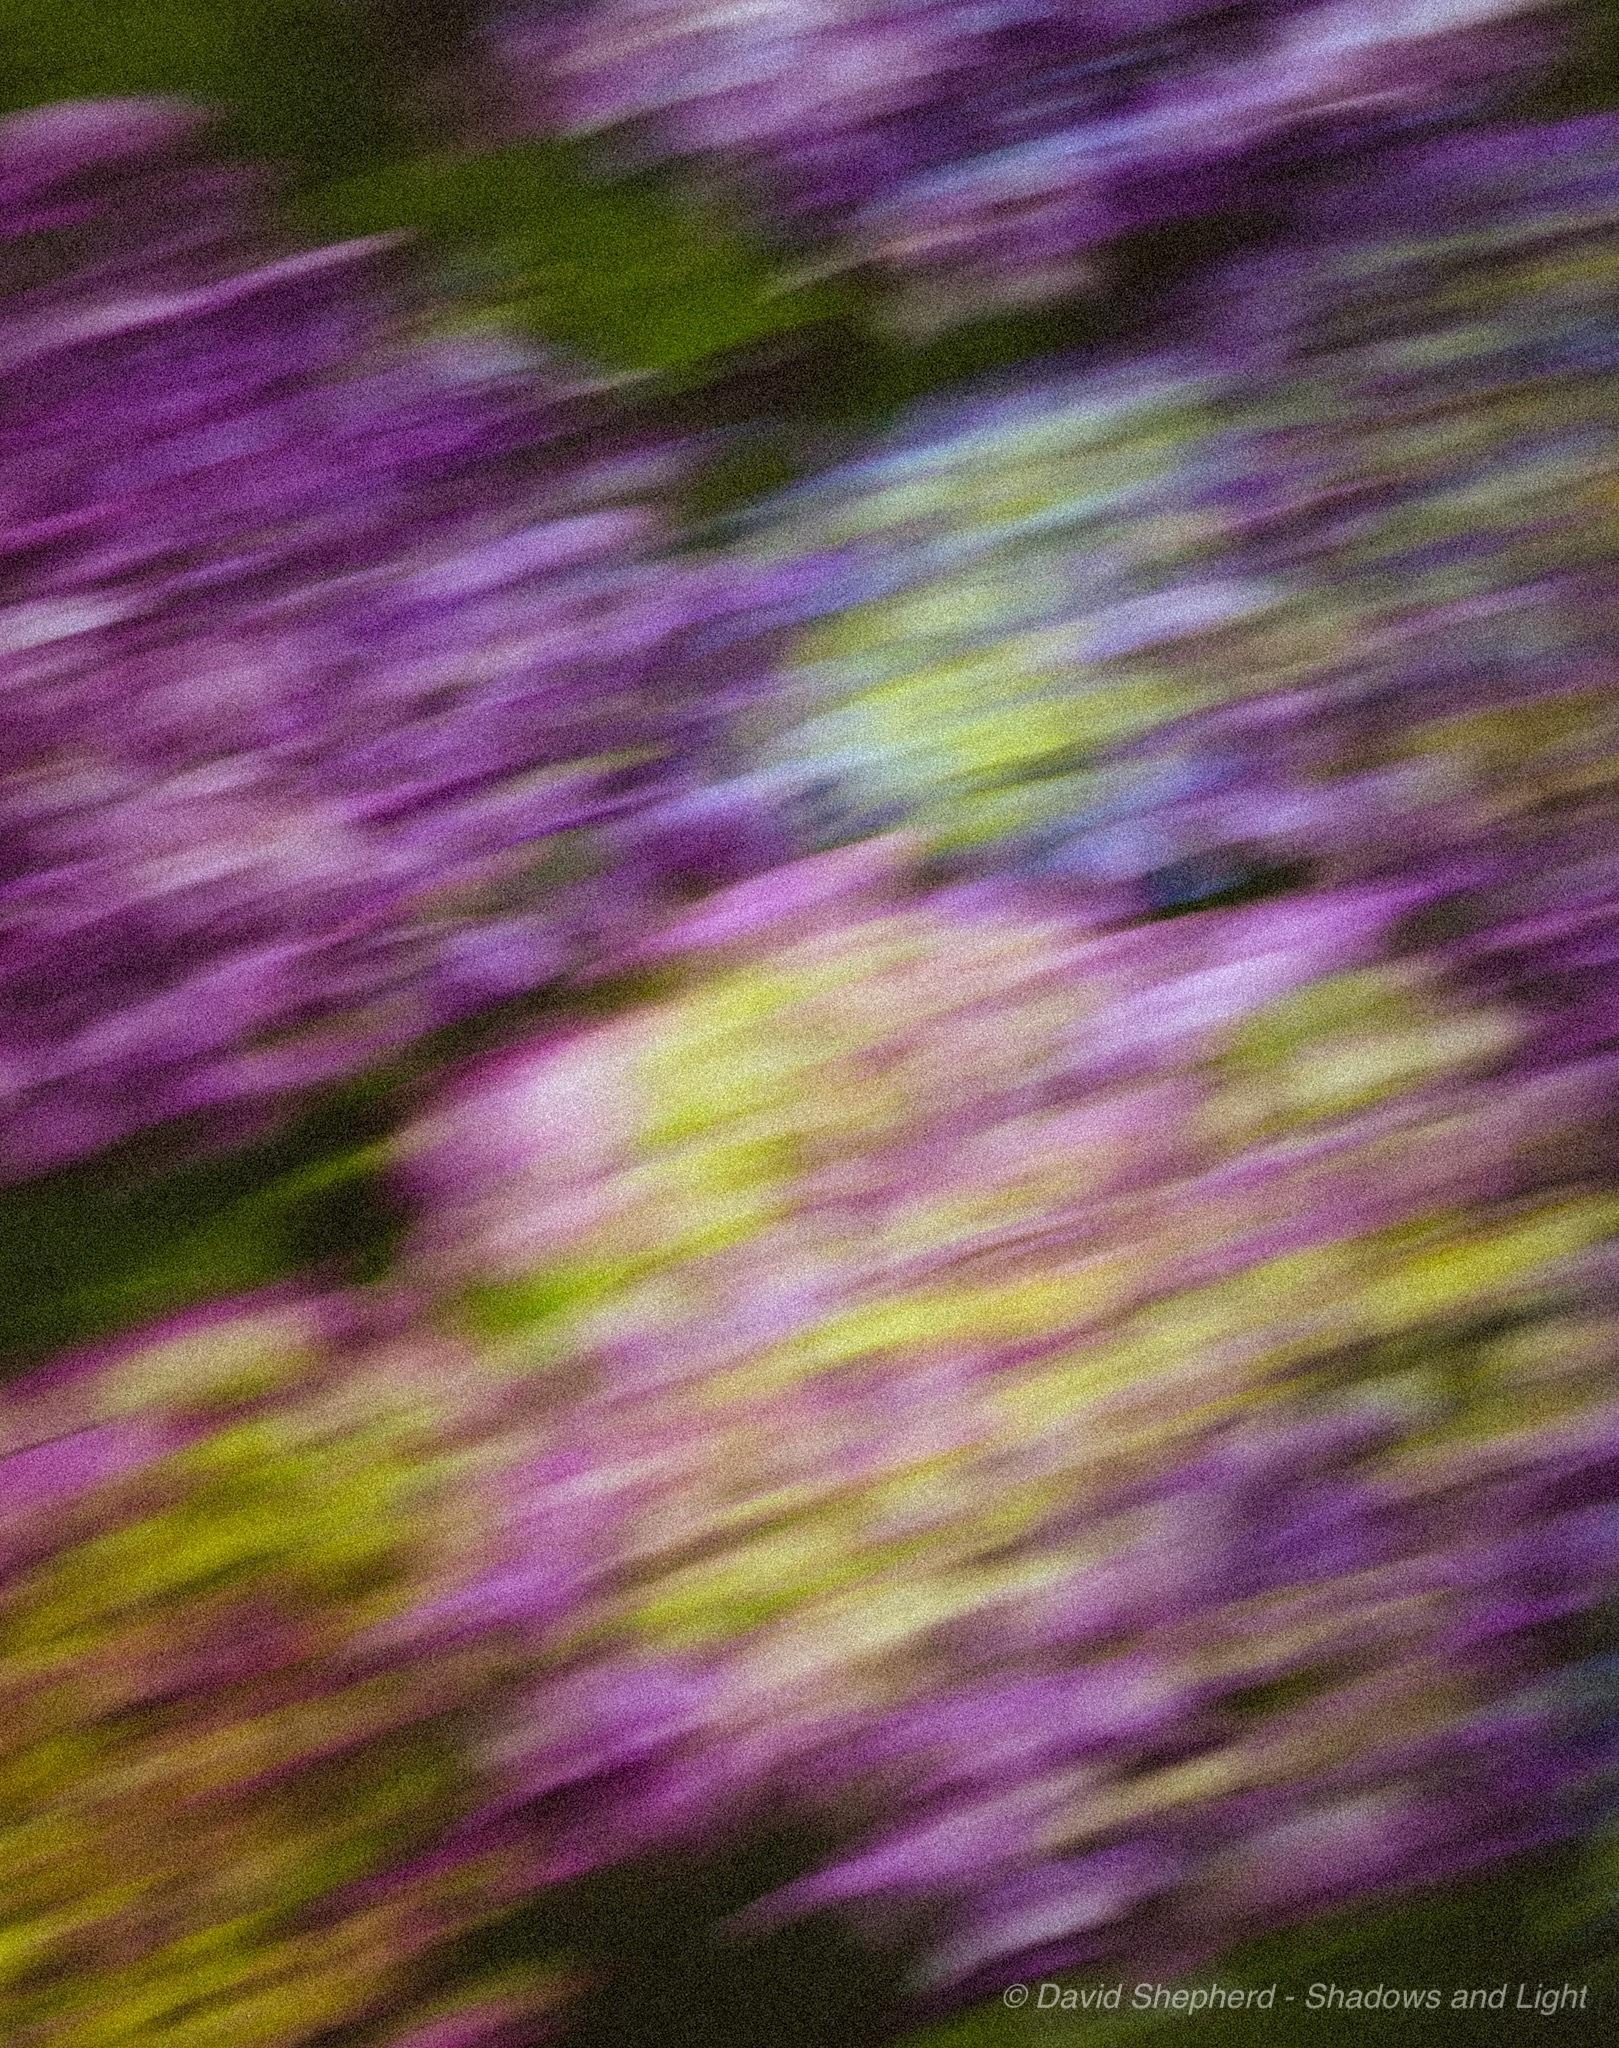 Abstract Hydrangeas  by David Shepherd -              Shadows and Light